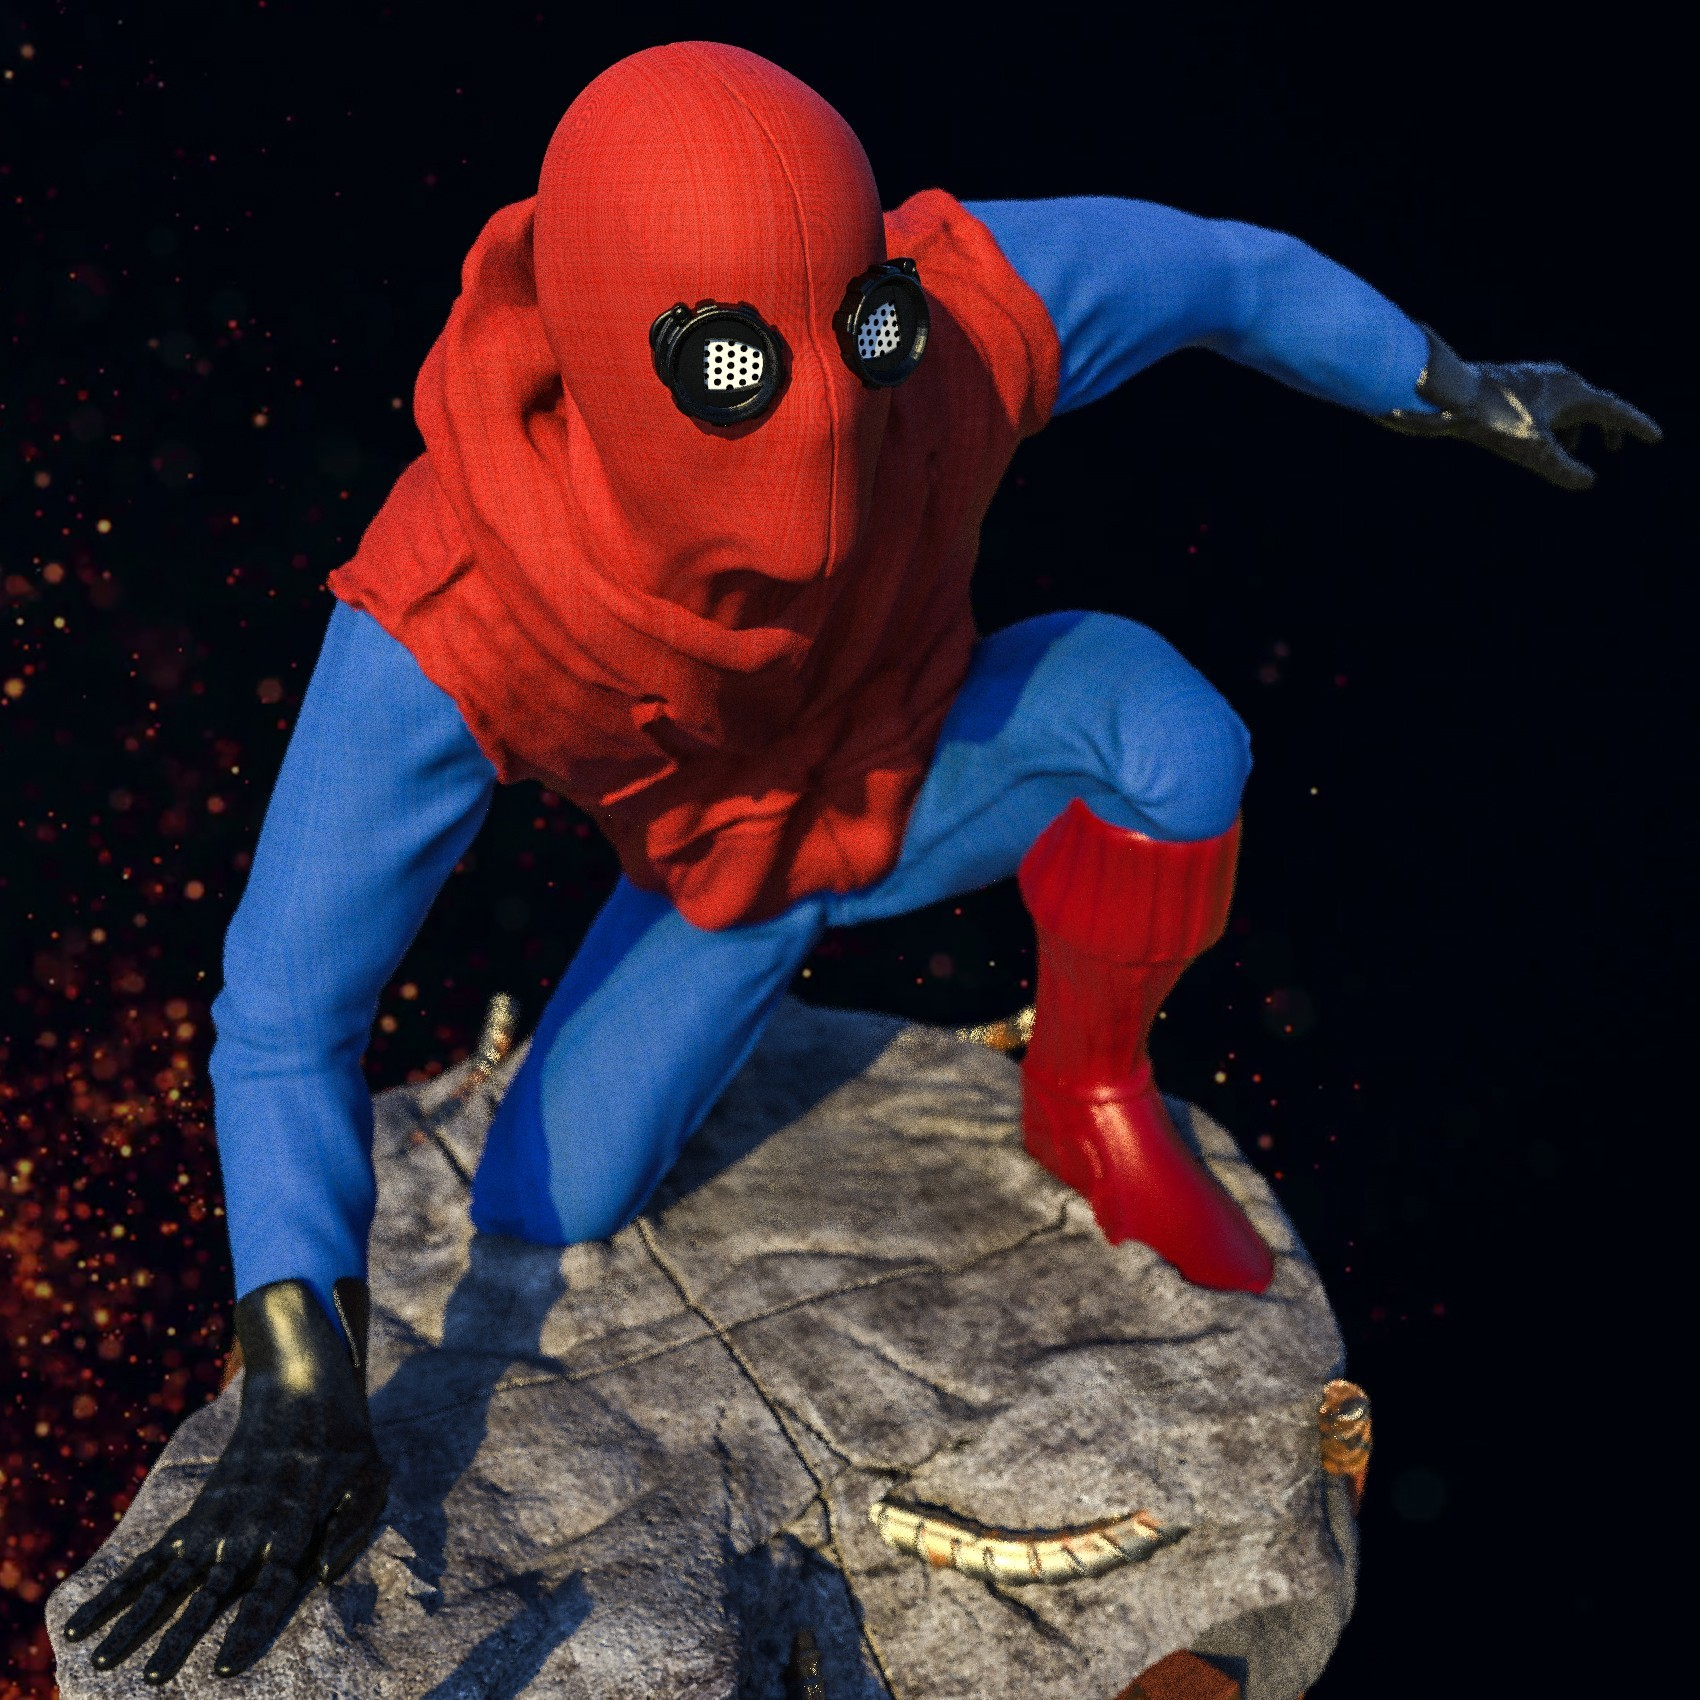 9.jpg Download STL file Spider-Man Homemade Suit • Design to 3D print, tolgaaxu